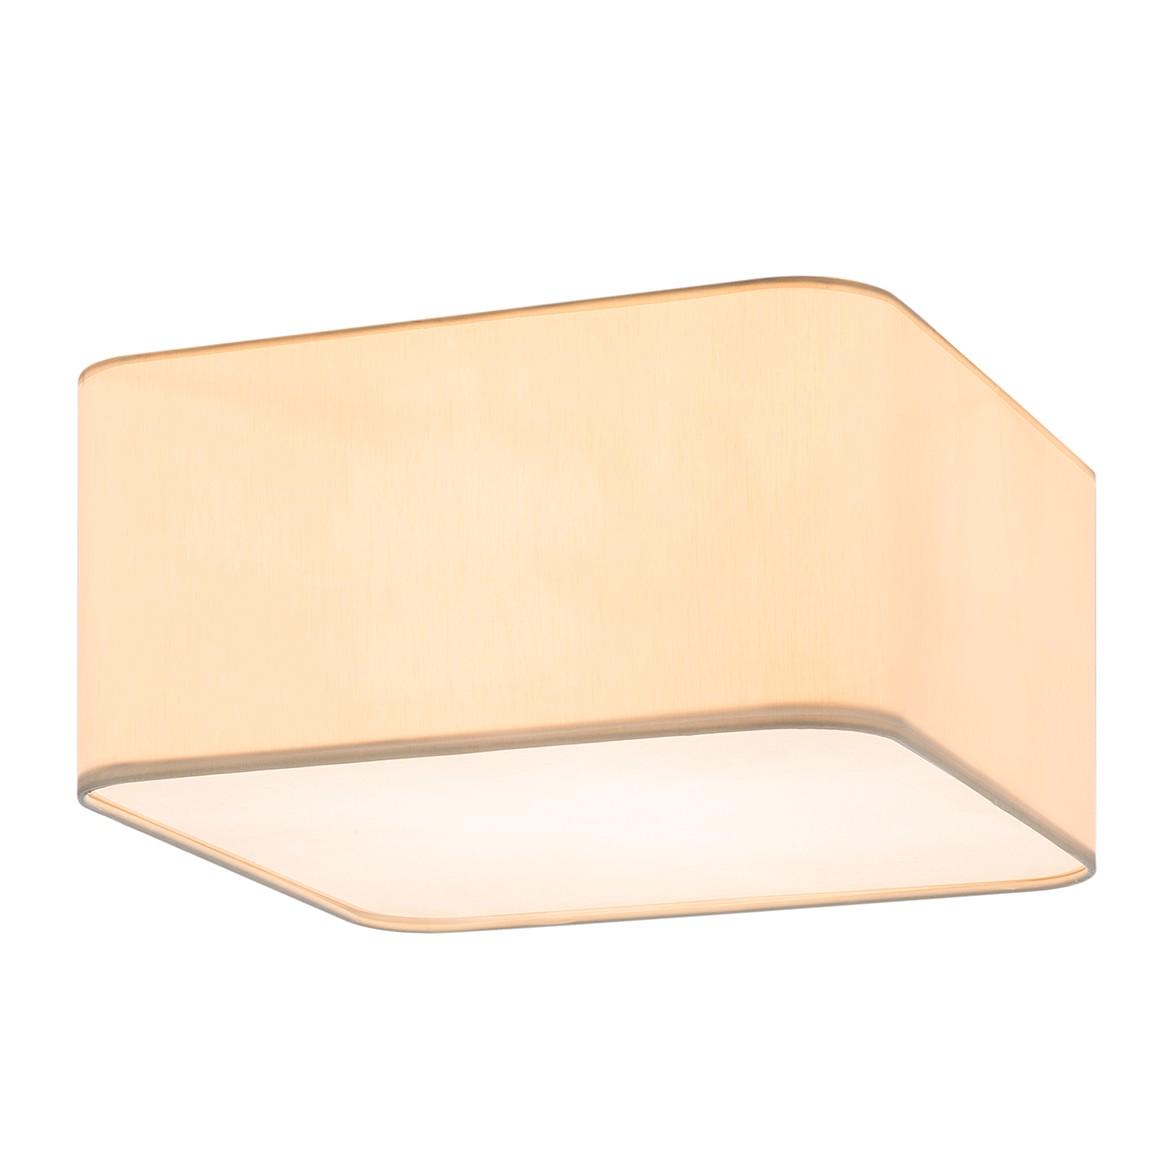 energie  A++, Plafondlamp Plafon - 40x40cm crèmekleurig 3 lichtbronnen, City Licht